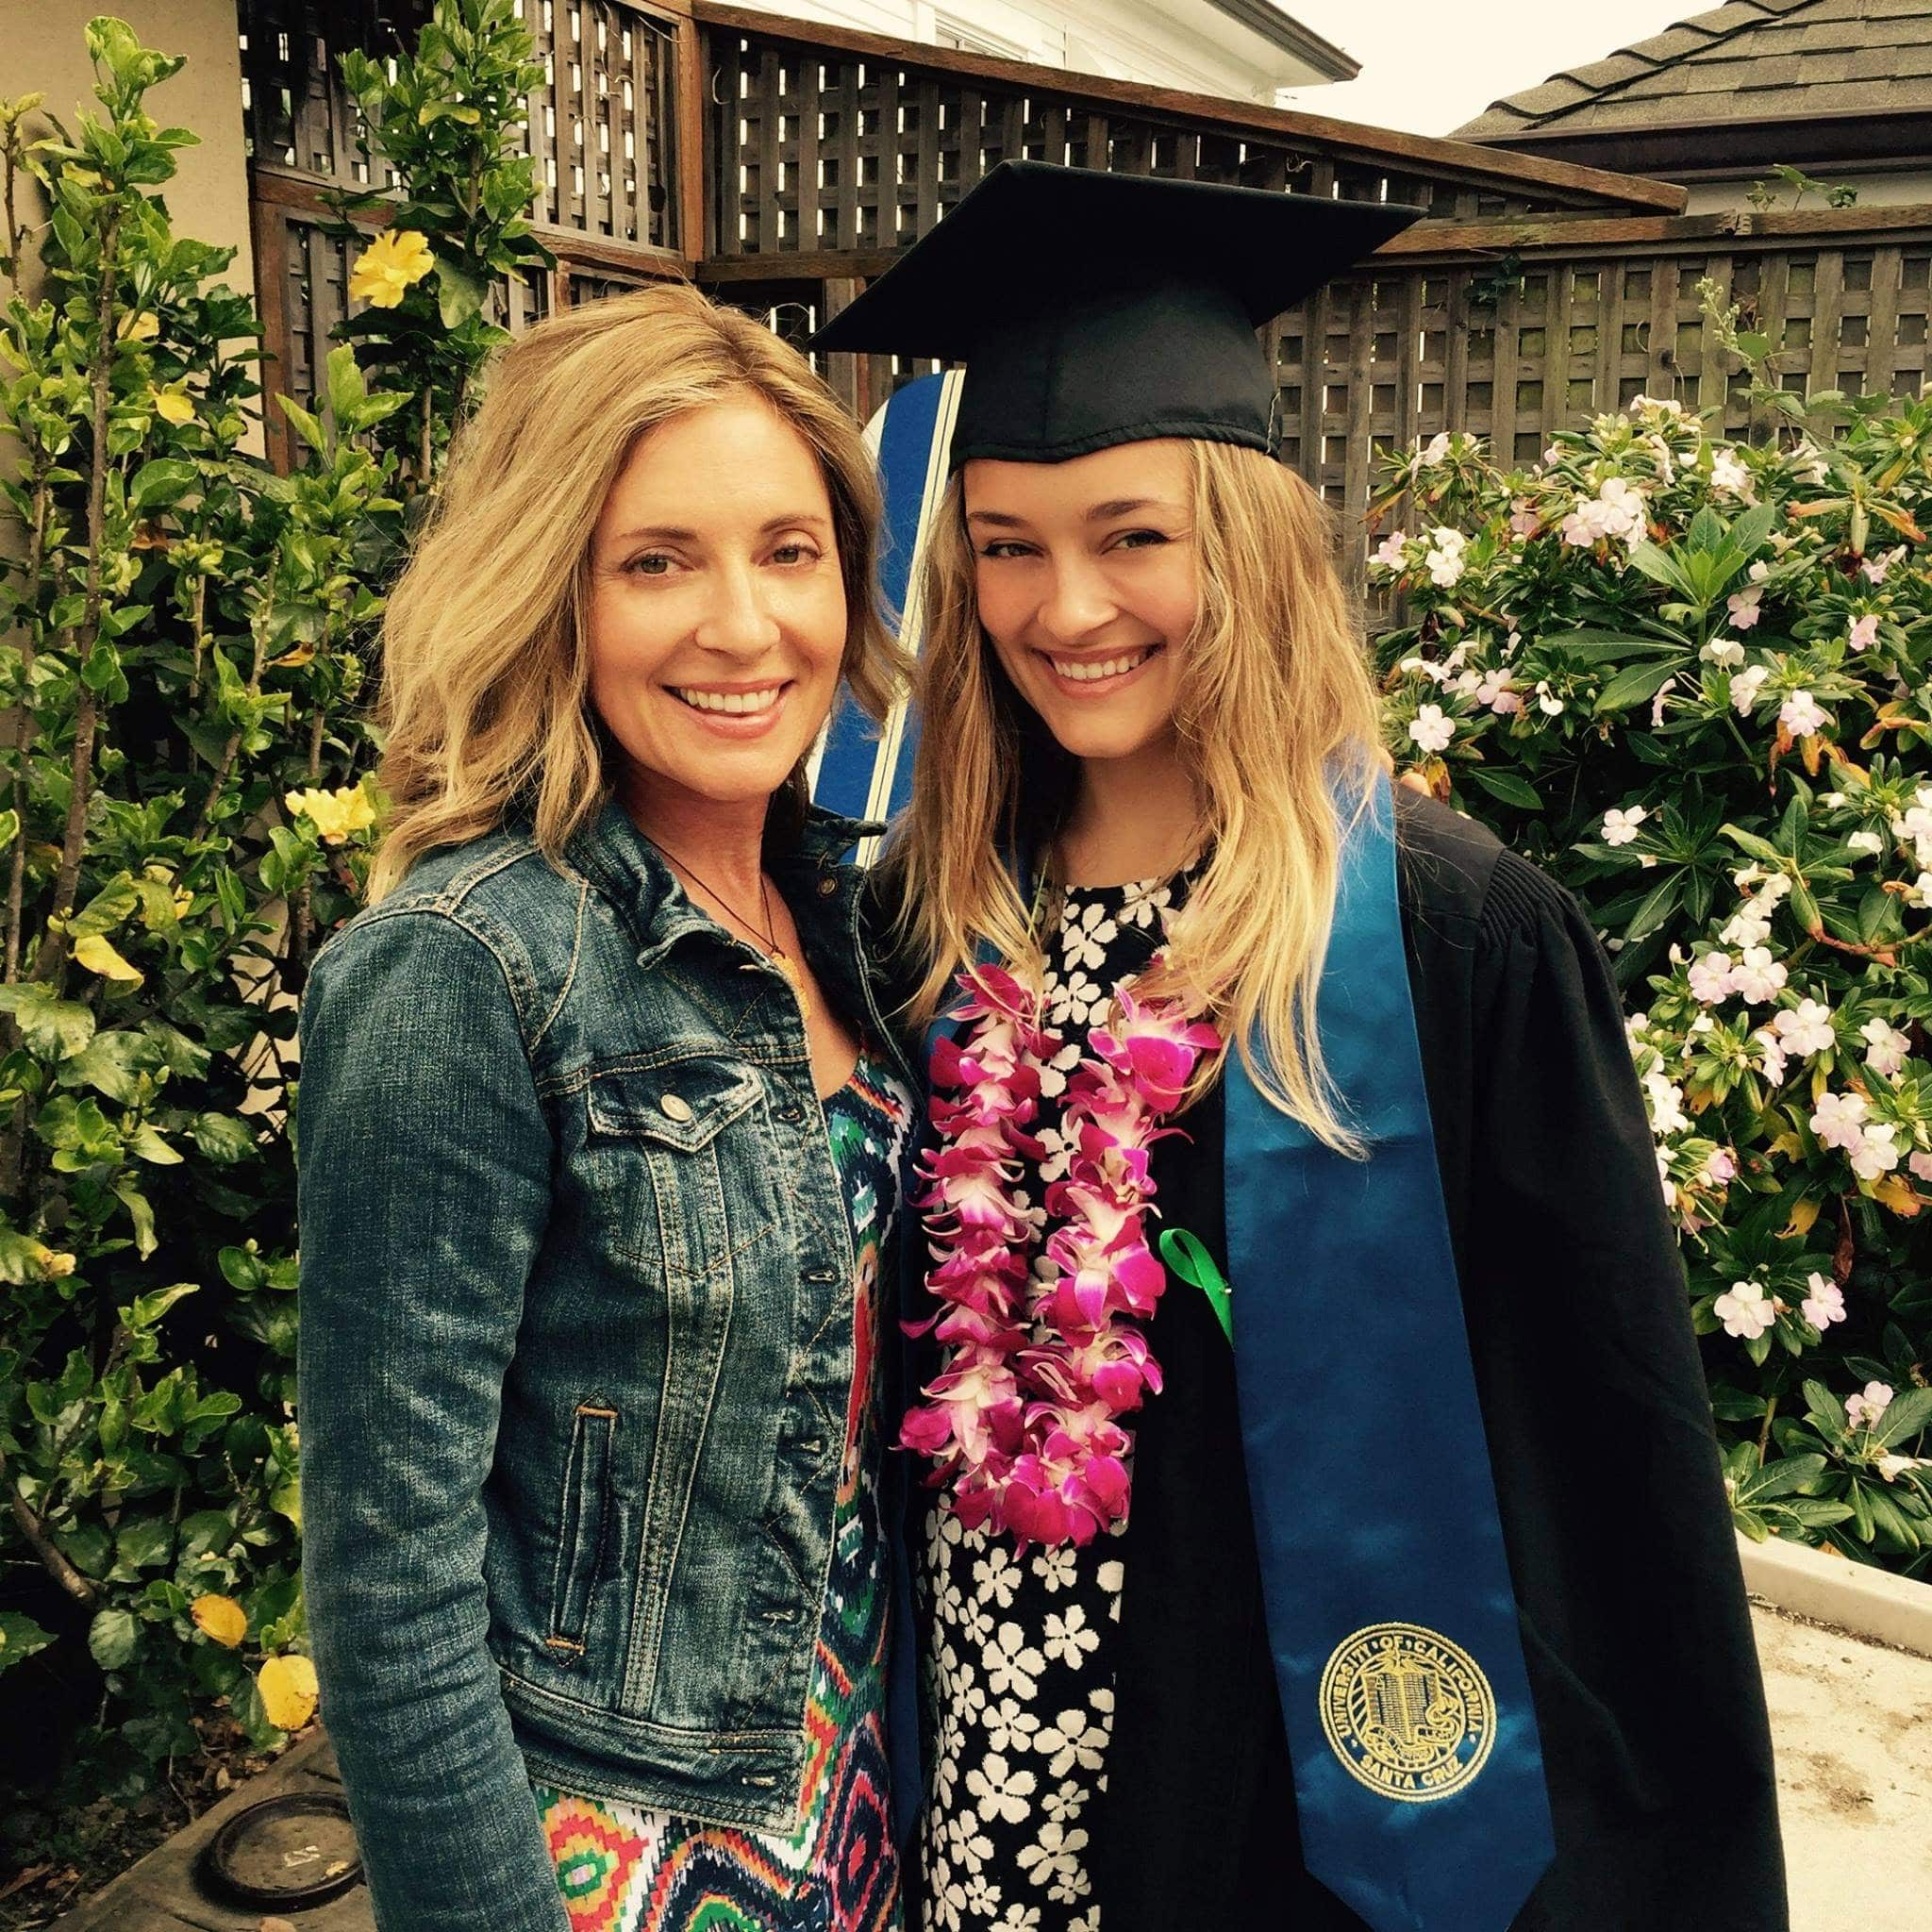 Taylor McLeod graduated from UC Santa Cruz